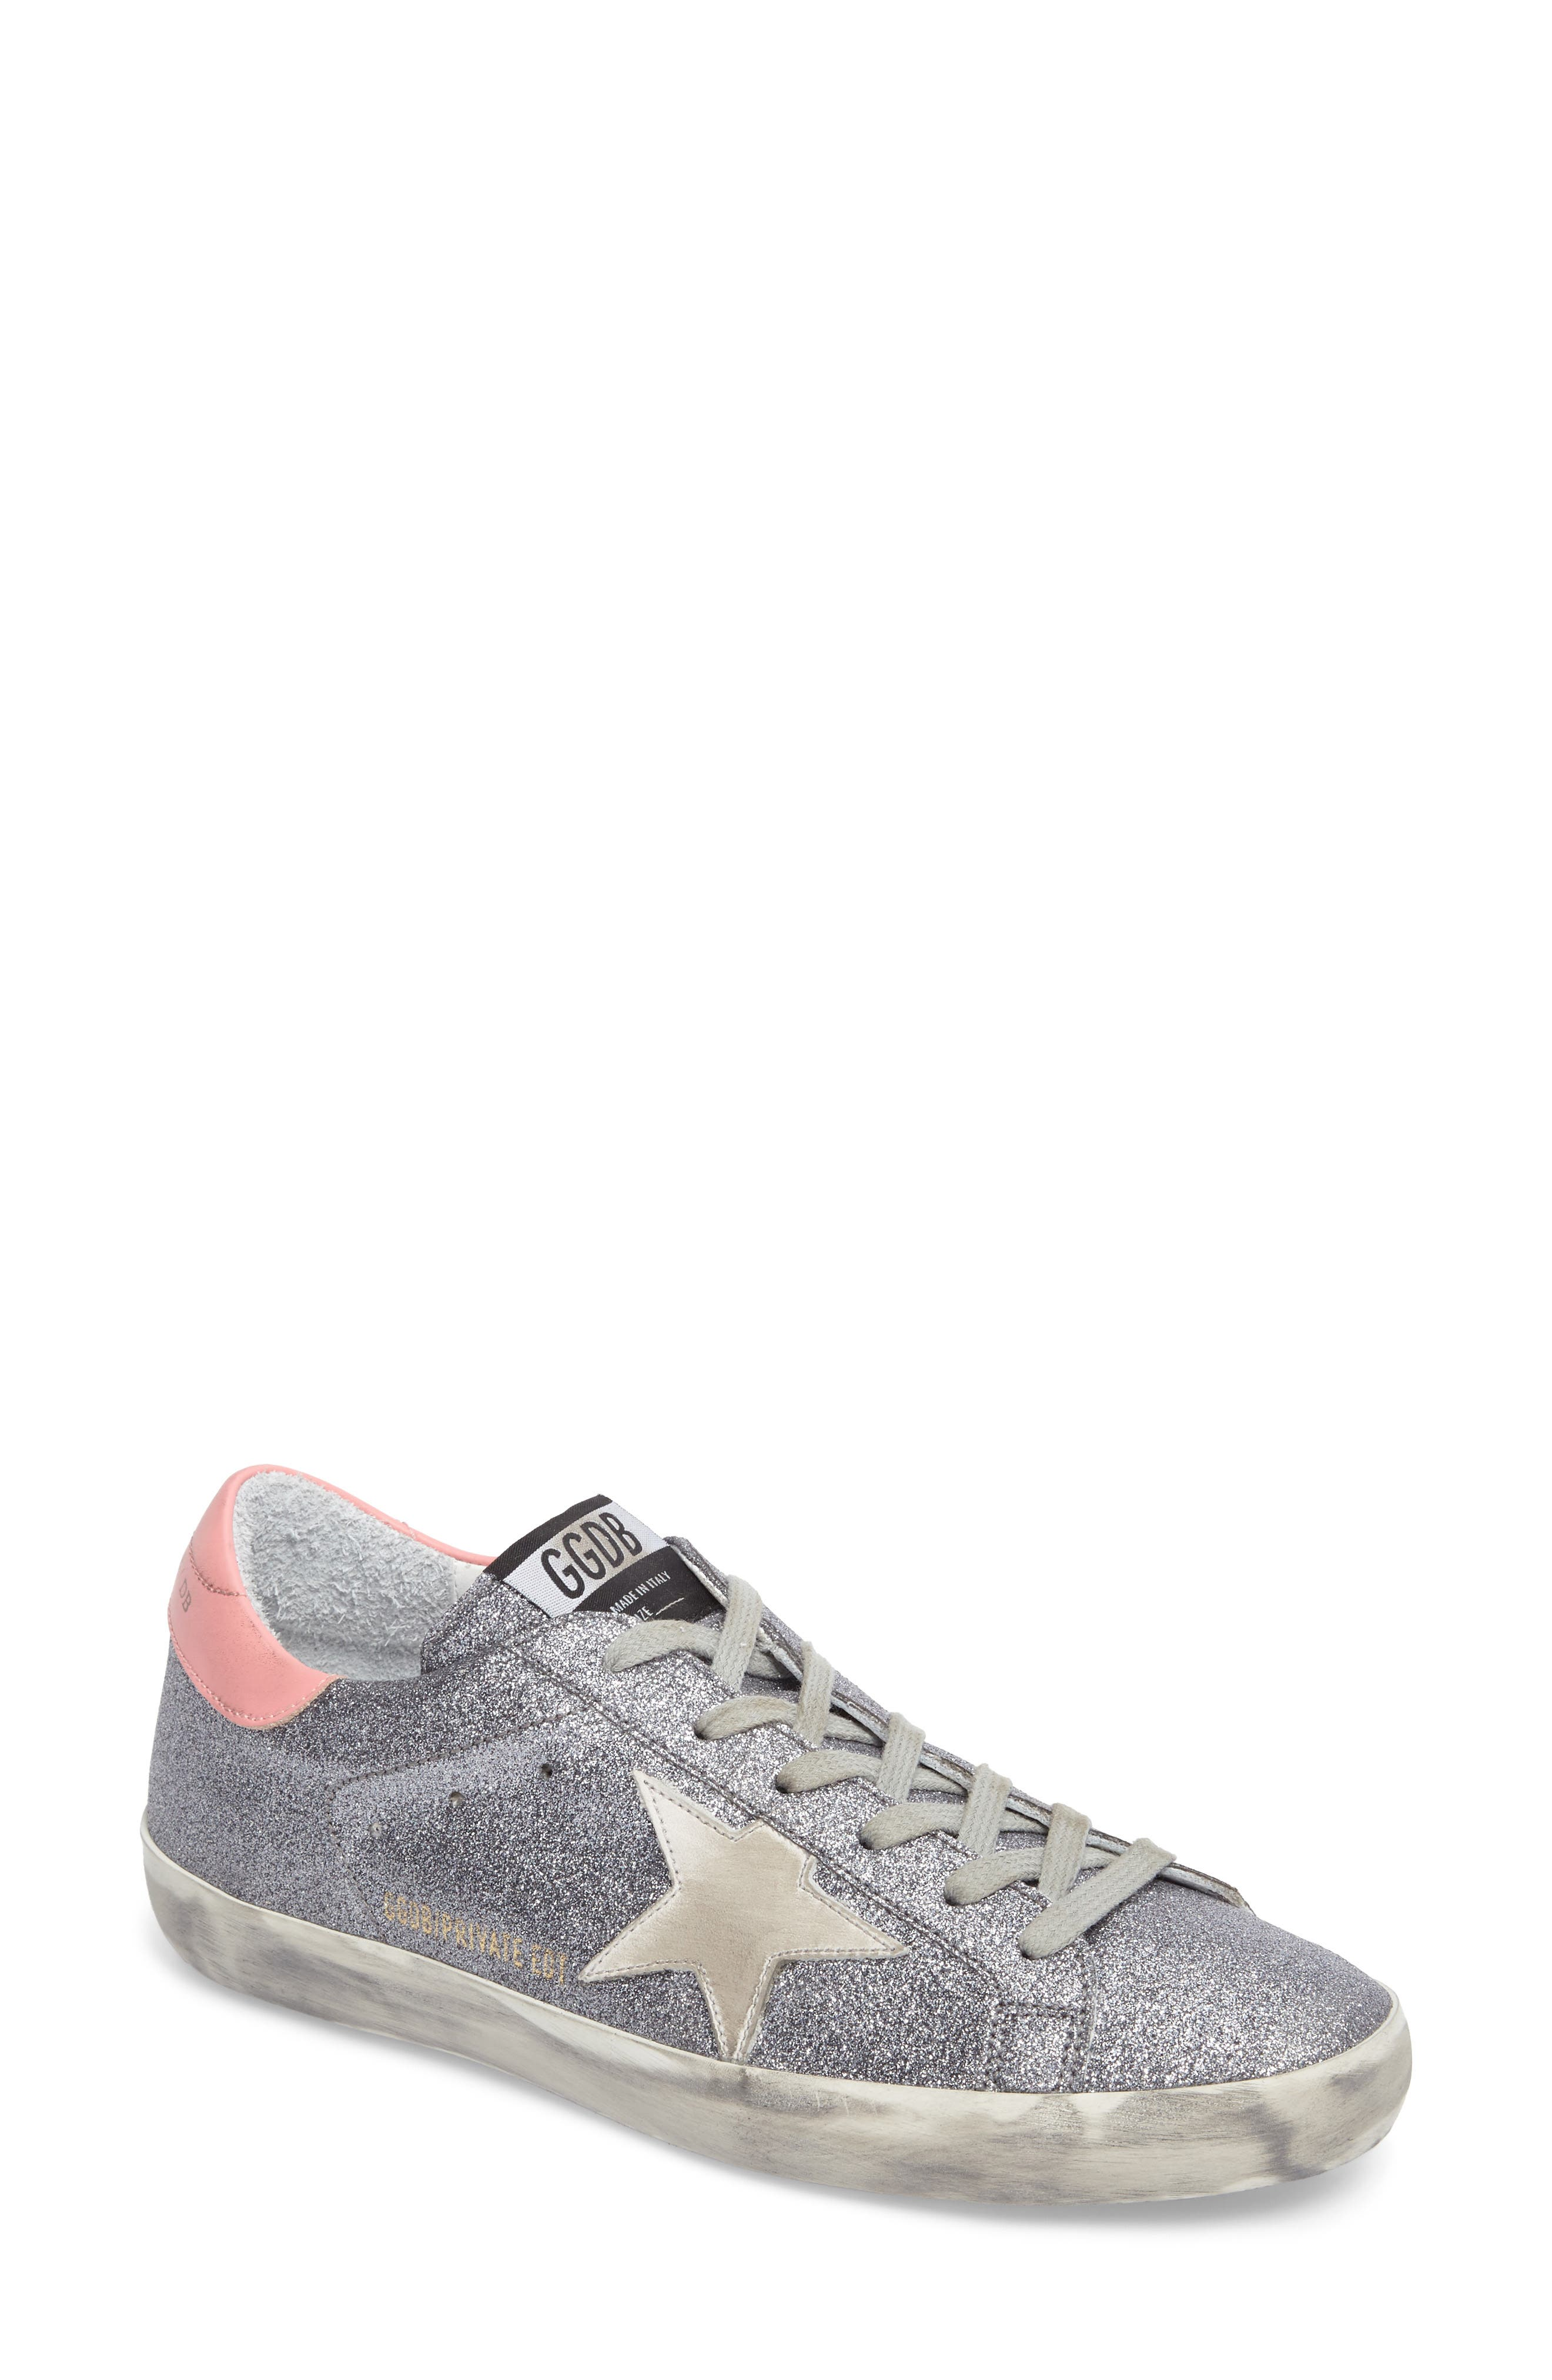 Superstar Low Top Sneaker,                             Main thumbnail 1, color,                             Gunmetal/ White